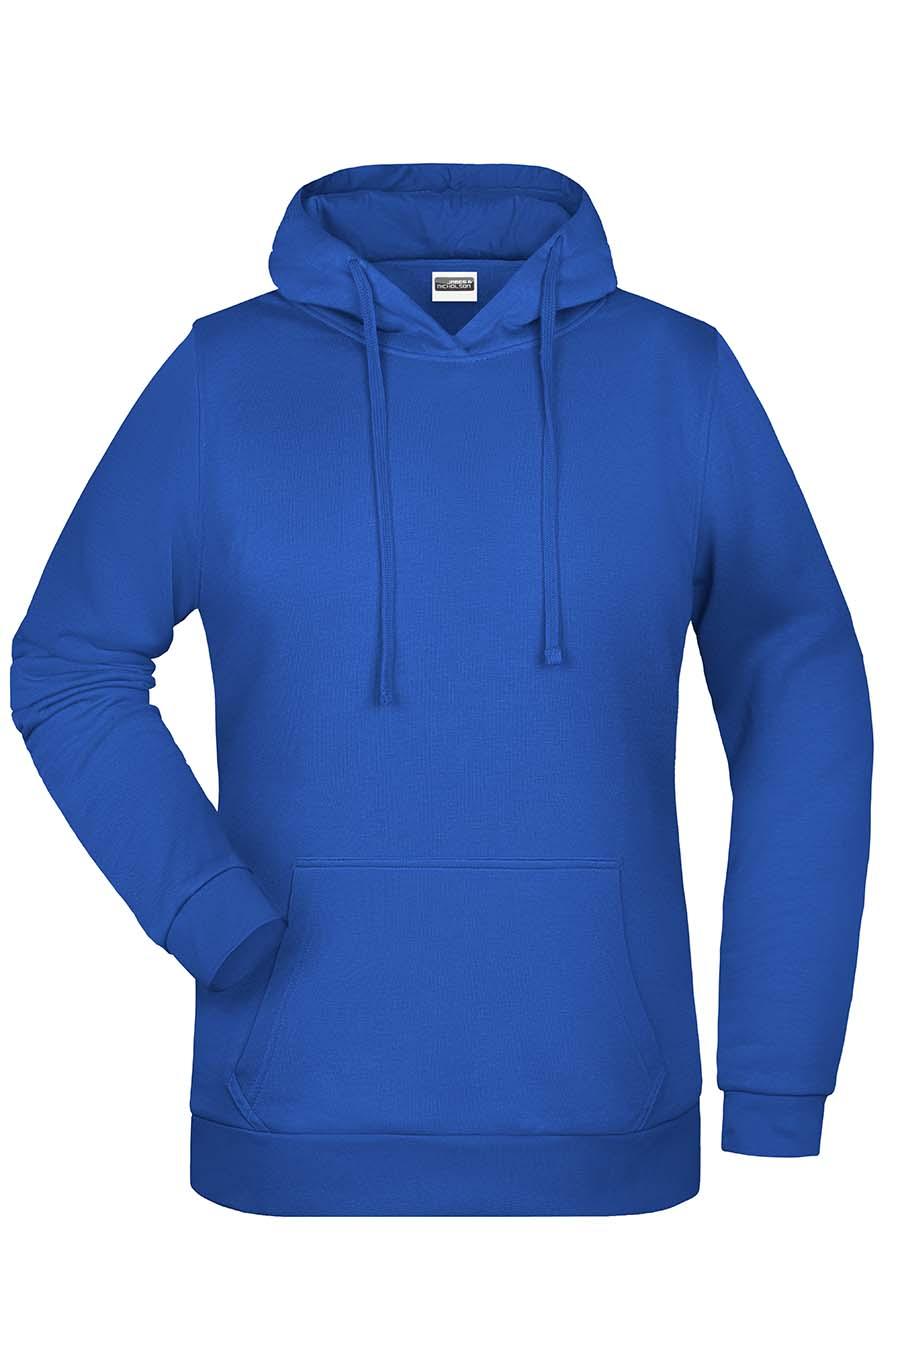 Sweat-shirt capuche femme - 20-1494-18